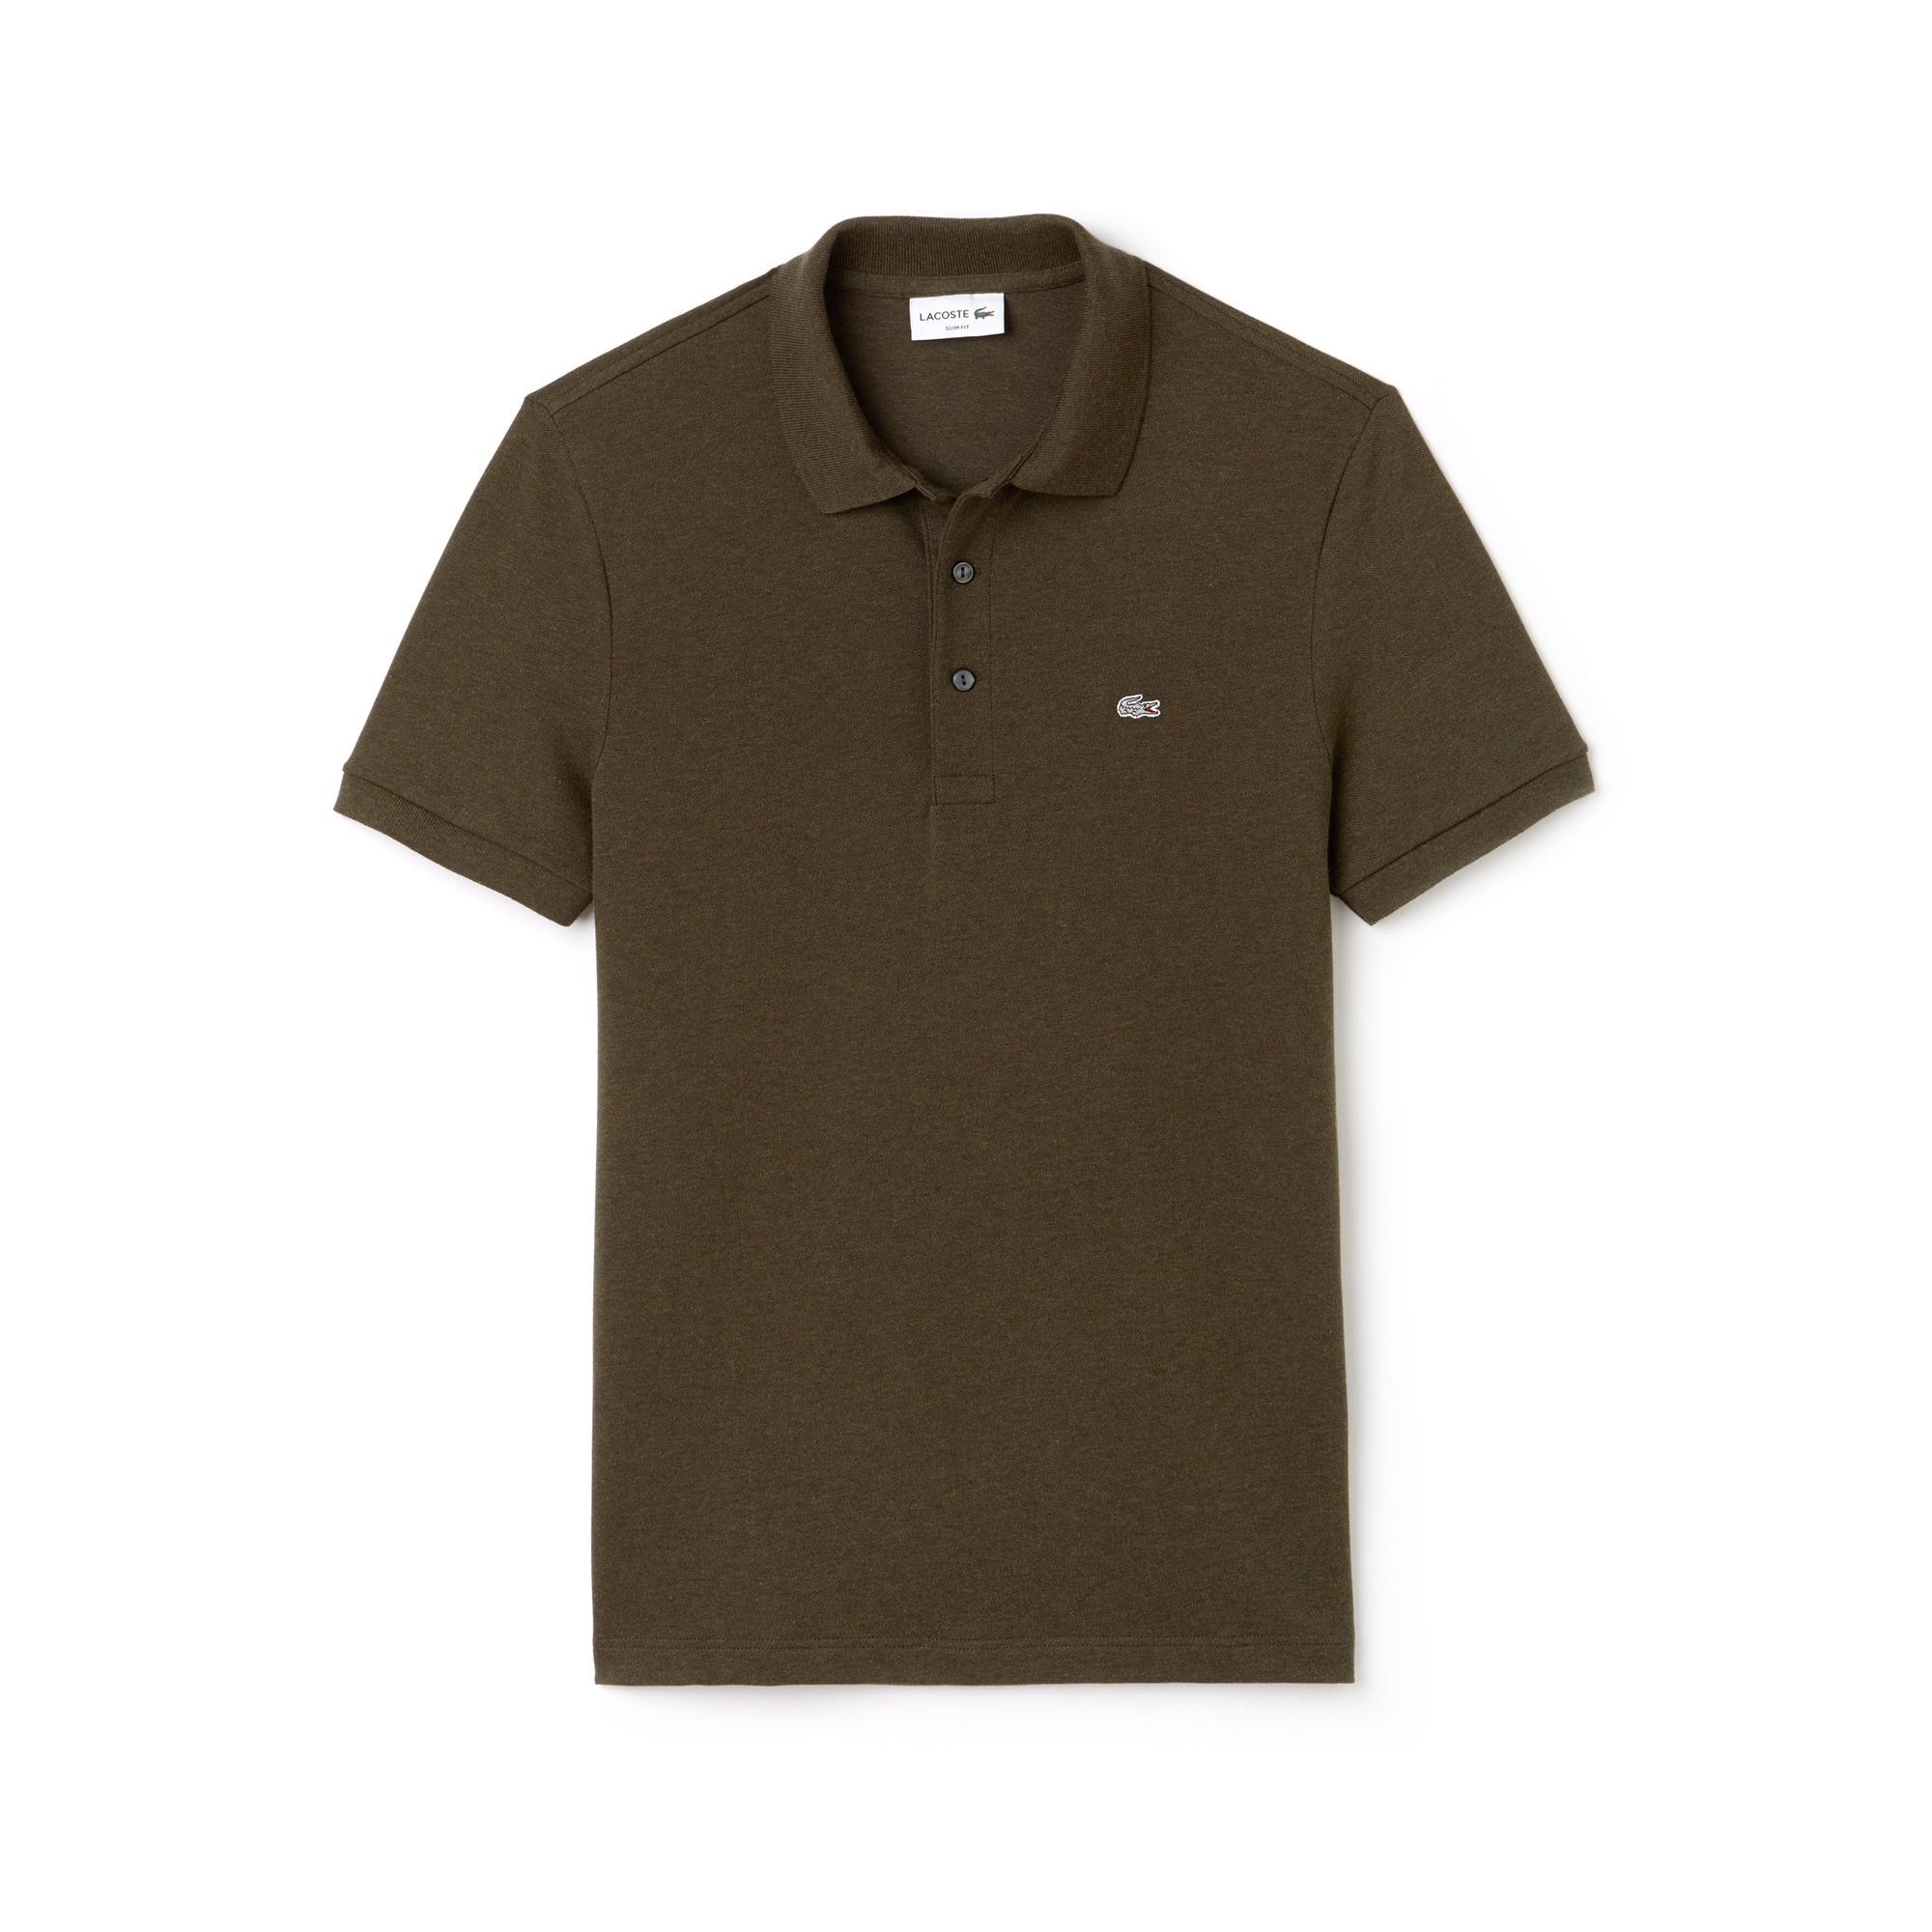 59627905ae7b Men s Slim fit Lacoste Polo Shirt in stretch petit piqué ...